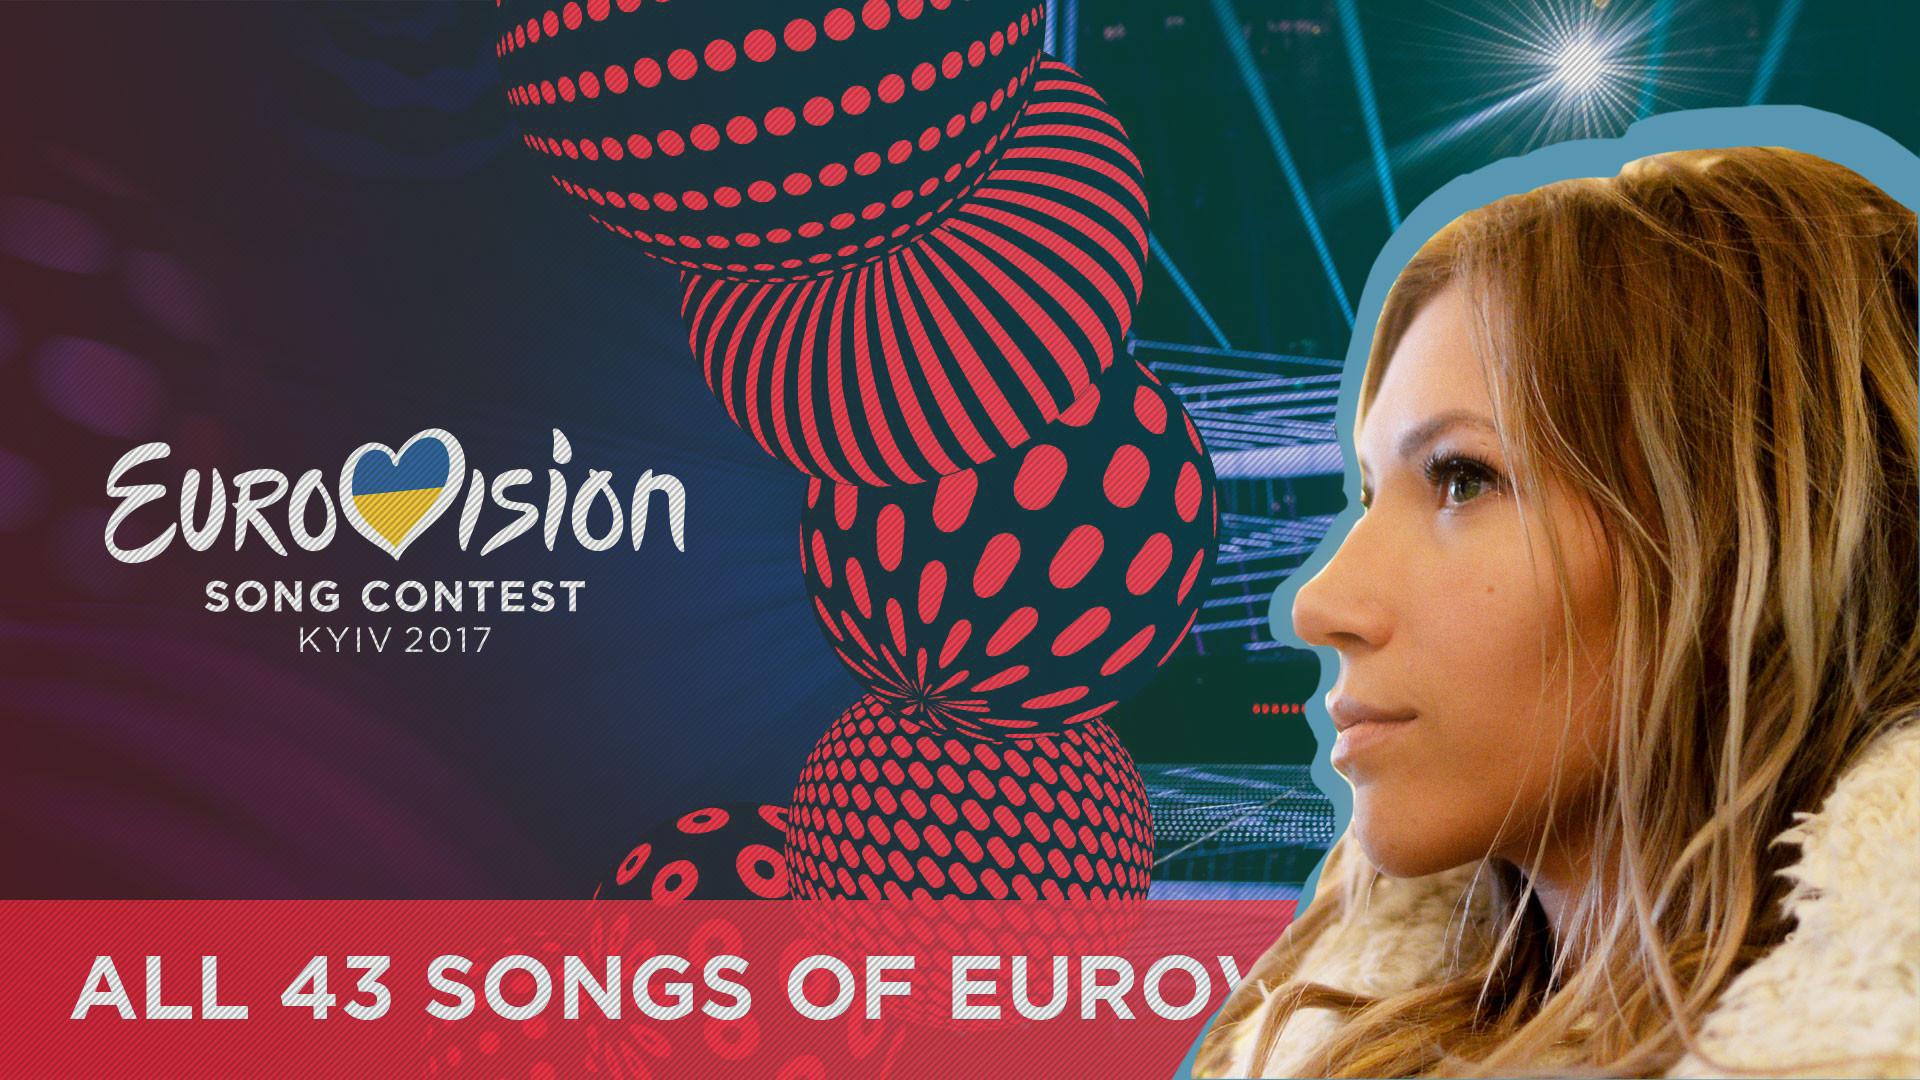 "<p>Коллаж &copy; L!FE &nbsp;Фото: &copy; <a href=""https://www.facebook.com/EurovisionSongContest/photos/a.191849273006.126275.8419133006/10155129762623007/?type=3&amp;theater"" target=""_blank"">facebook.com/EurovisionSongContest</a>, РИА Новости /&nbsp;<span>Алексей Филиппов</span></p>"